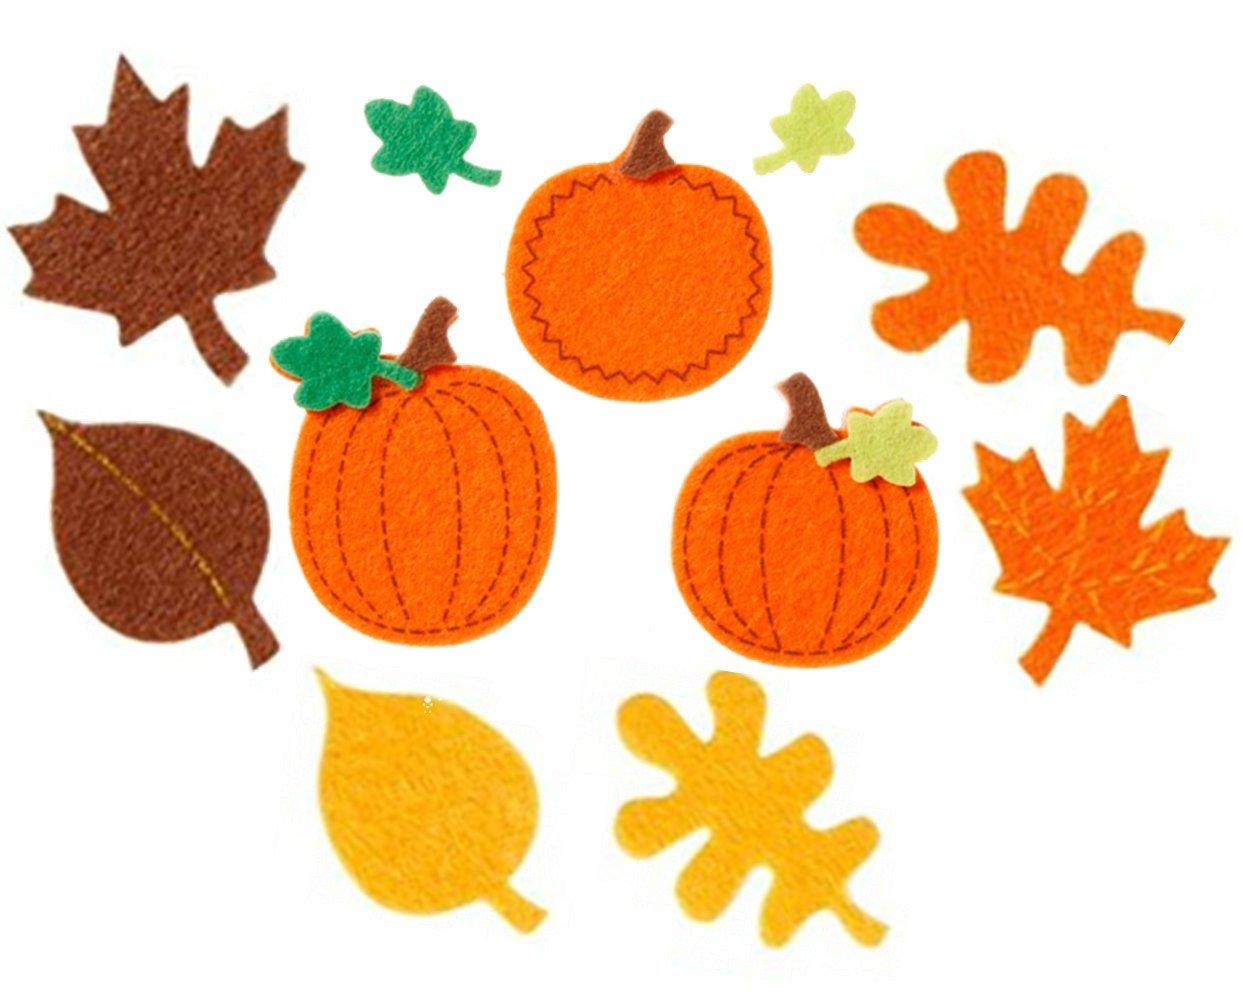 Nikki's Knick Knacks 90 Piece Autumn/Fall Felt Sticker Pumpkins & Leaves